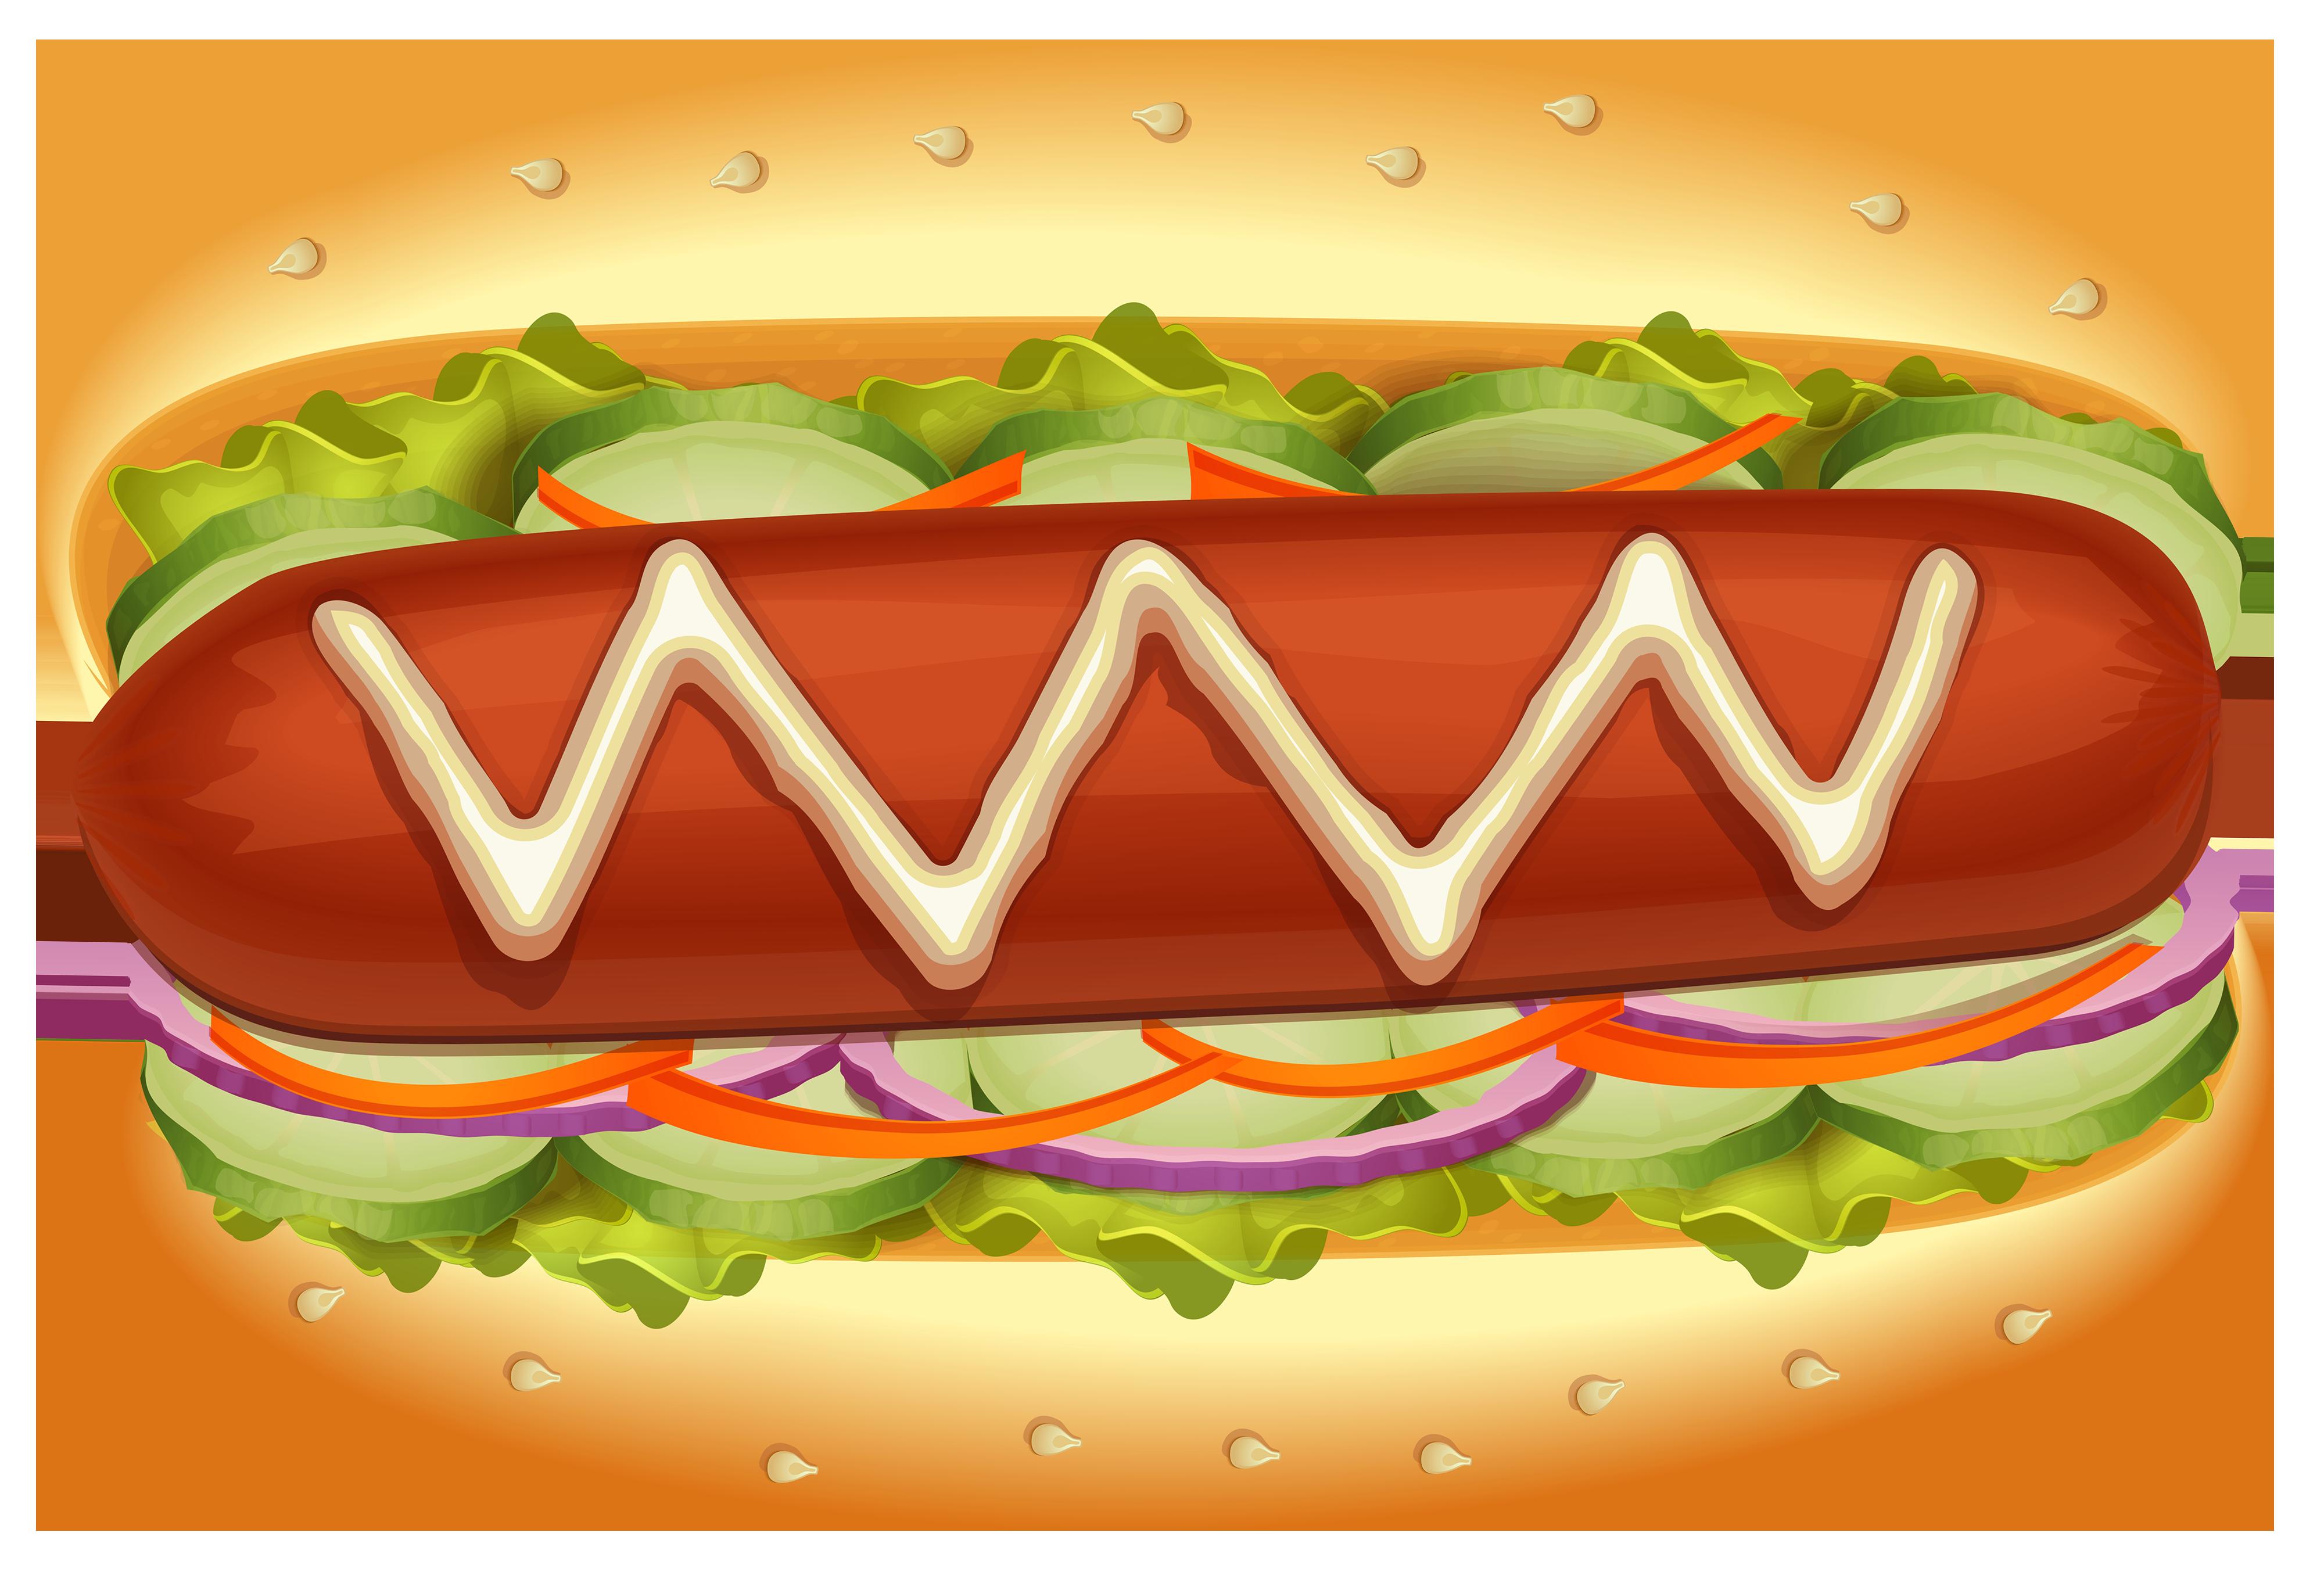 Fast food clip art salad clipart free download.